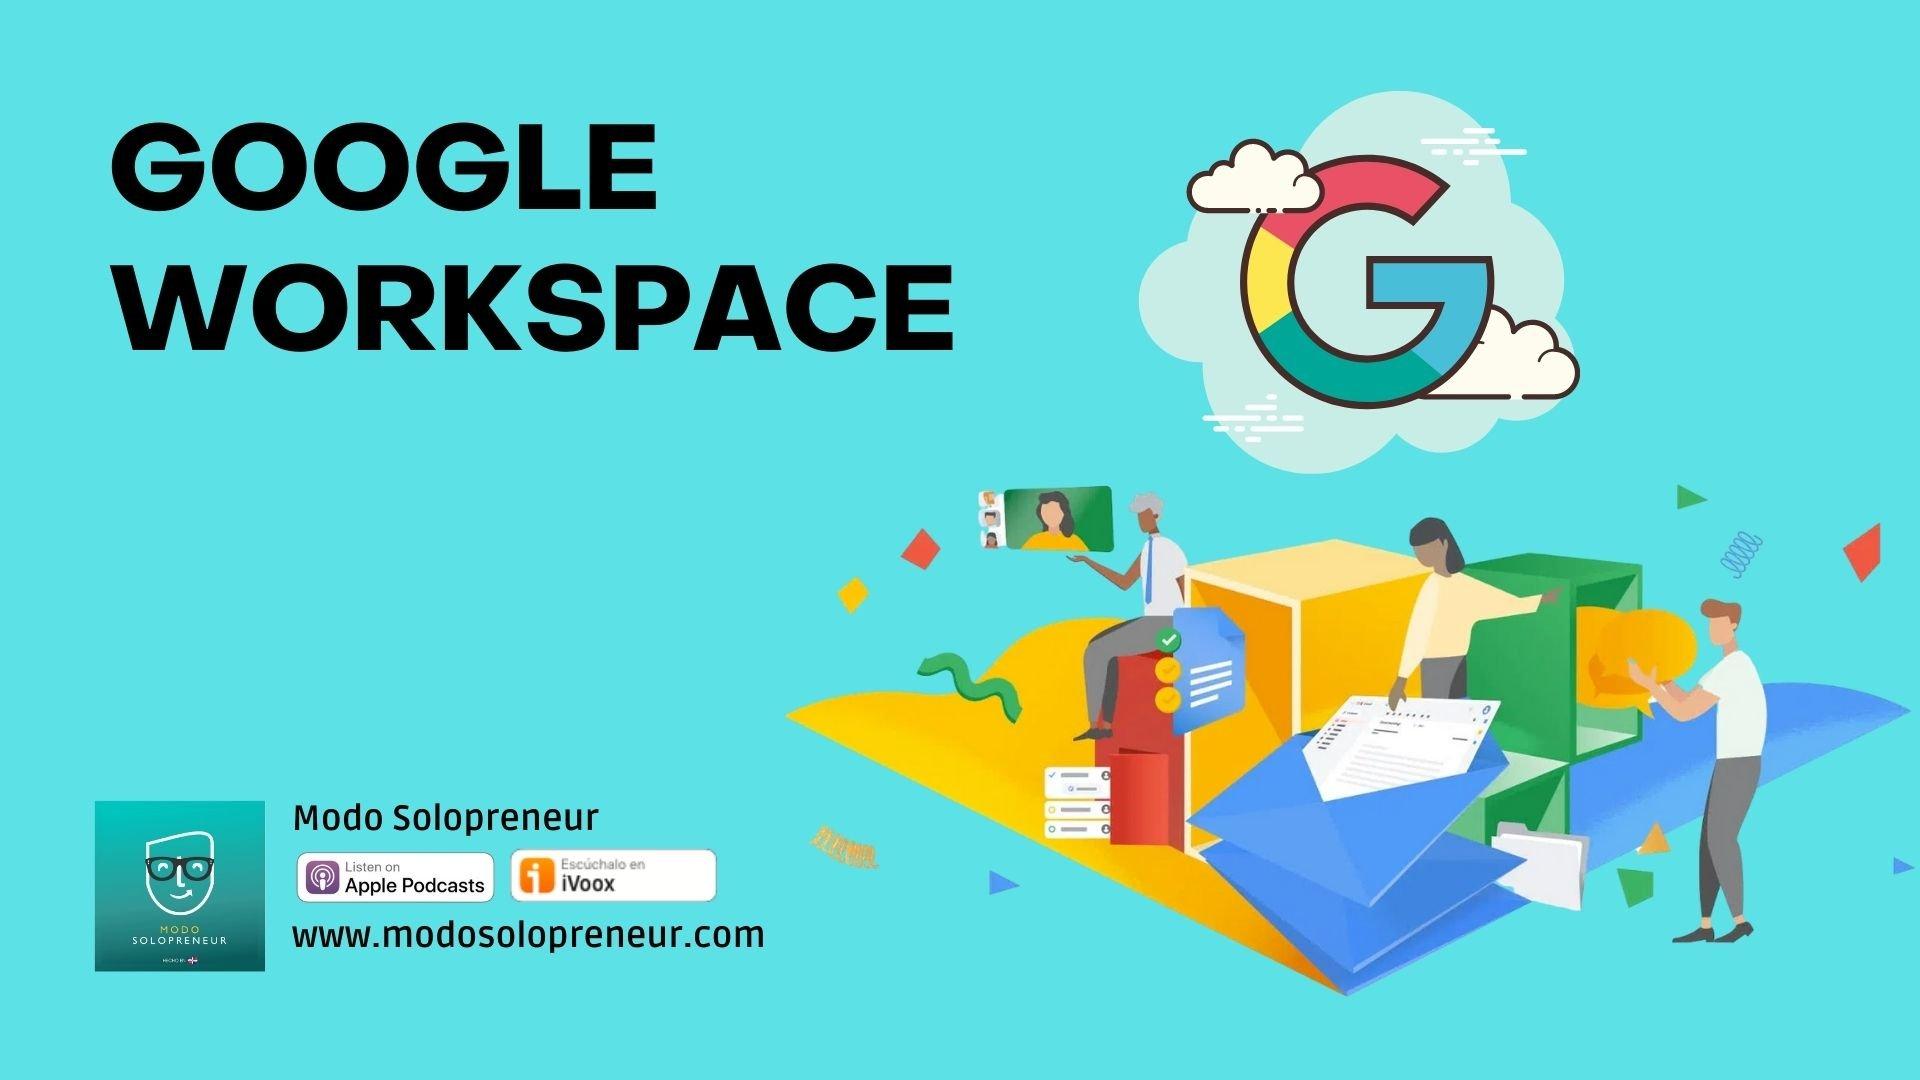 Google Workspace: Herramienta imprescindible para el solopreneur